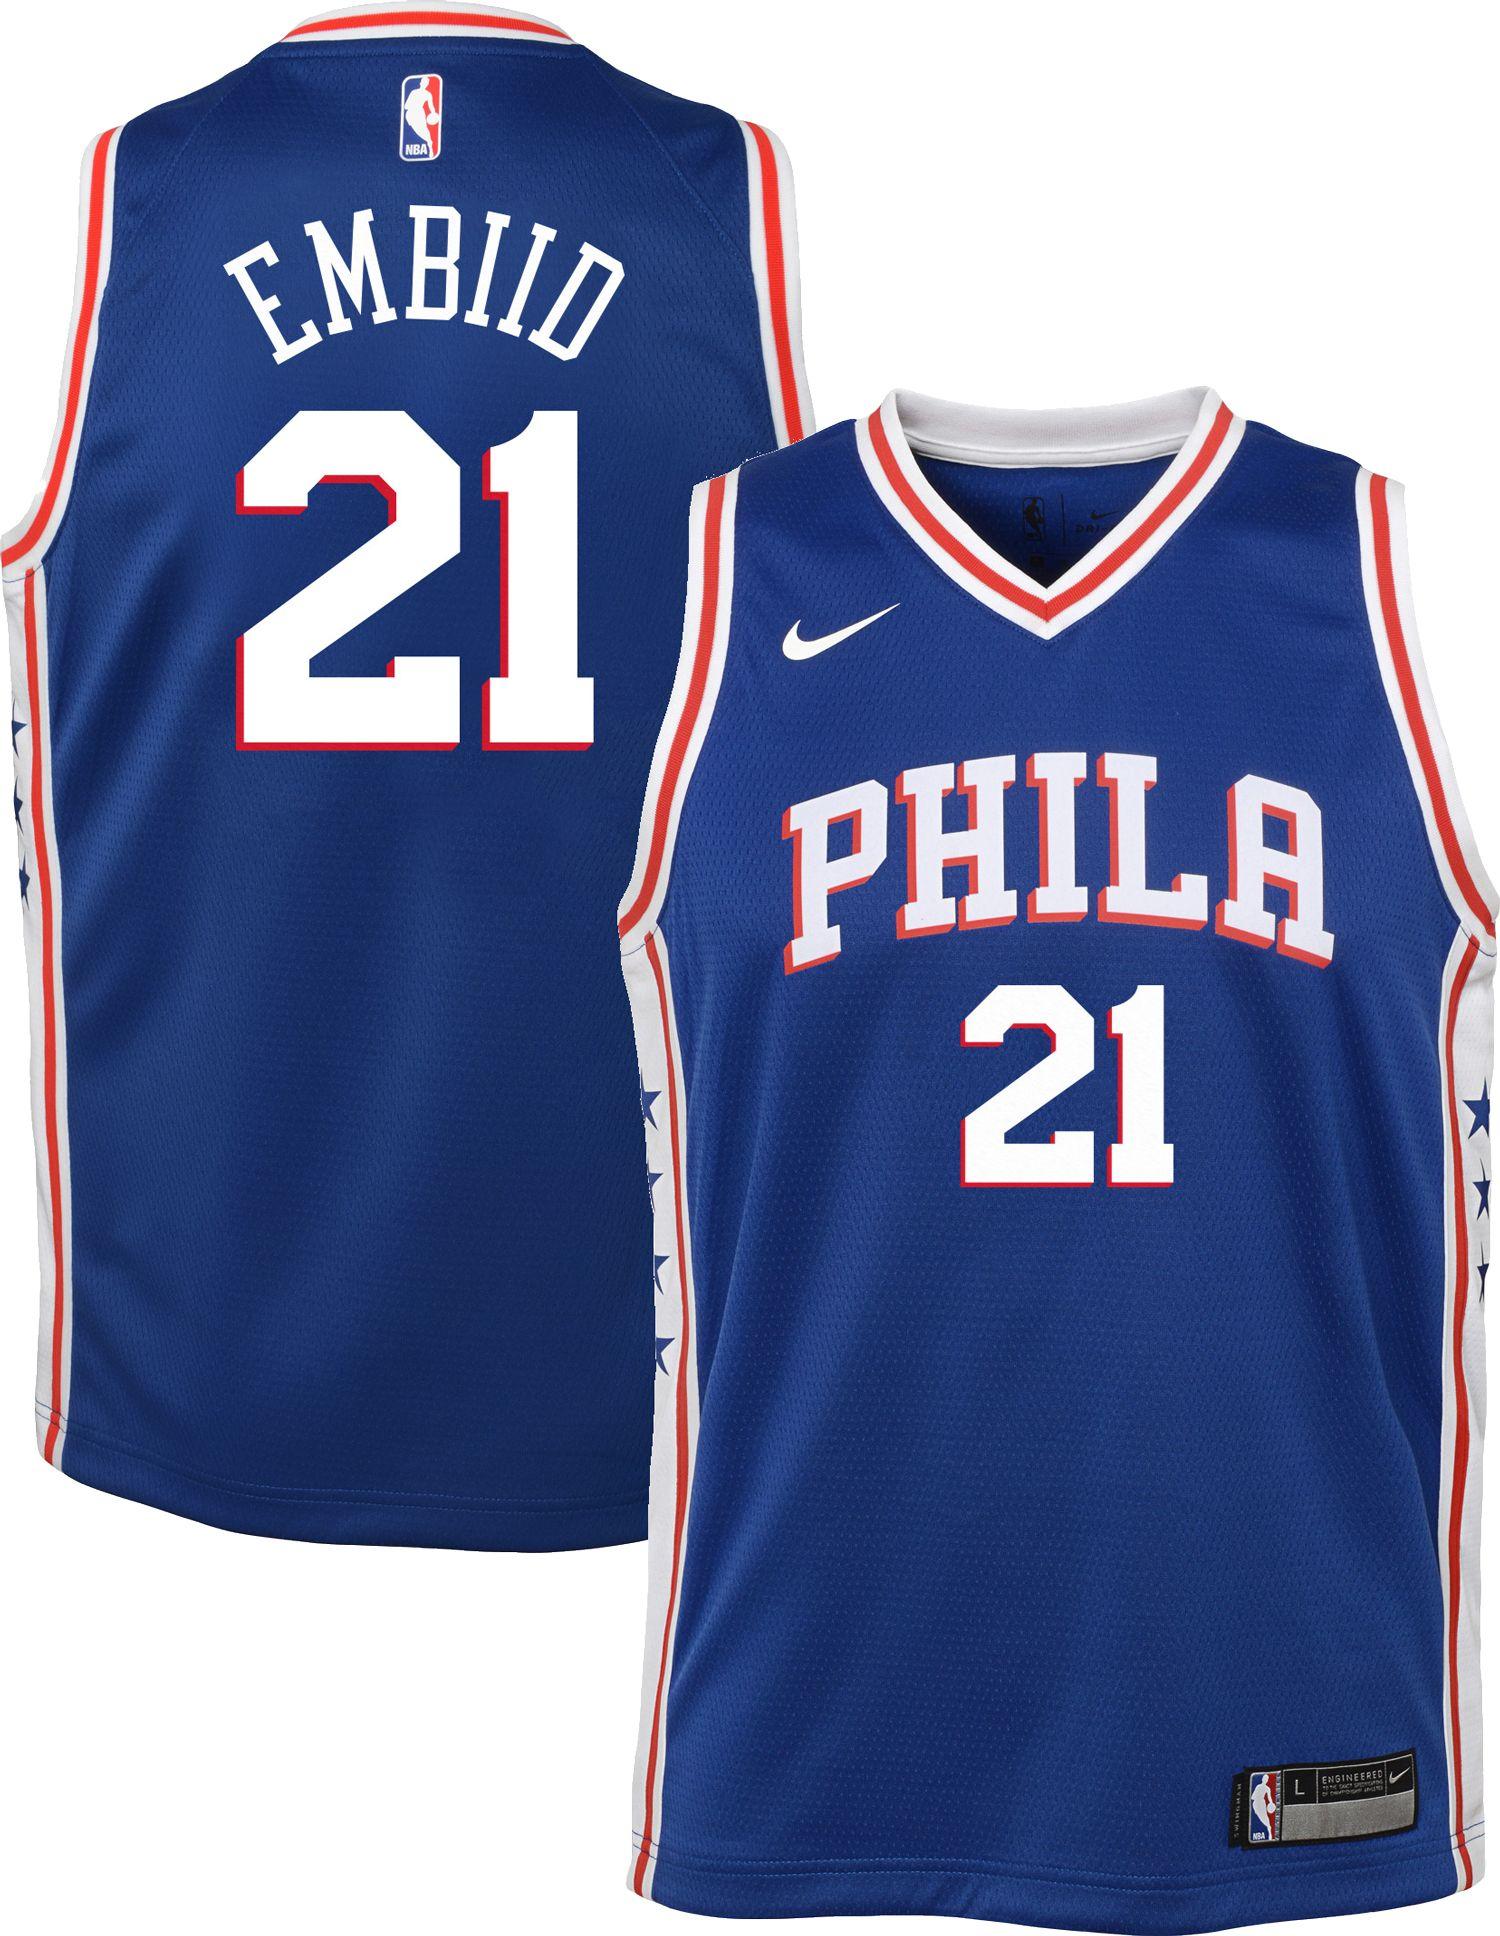 a06ffe3f6 ... amazon nike youth philadelphia 76ers joel embiid 21 royal dri fit  swingman jersey 23845 3693b